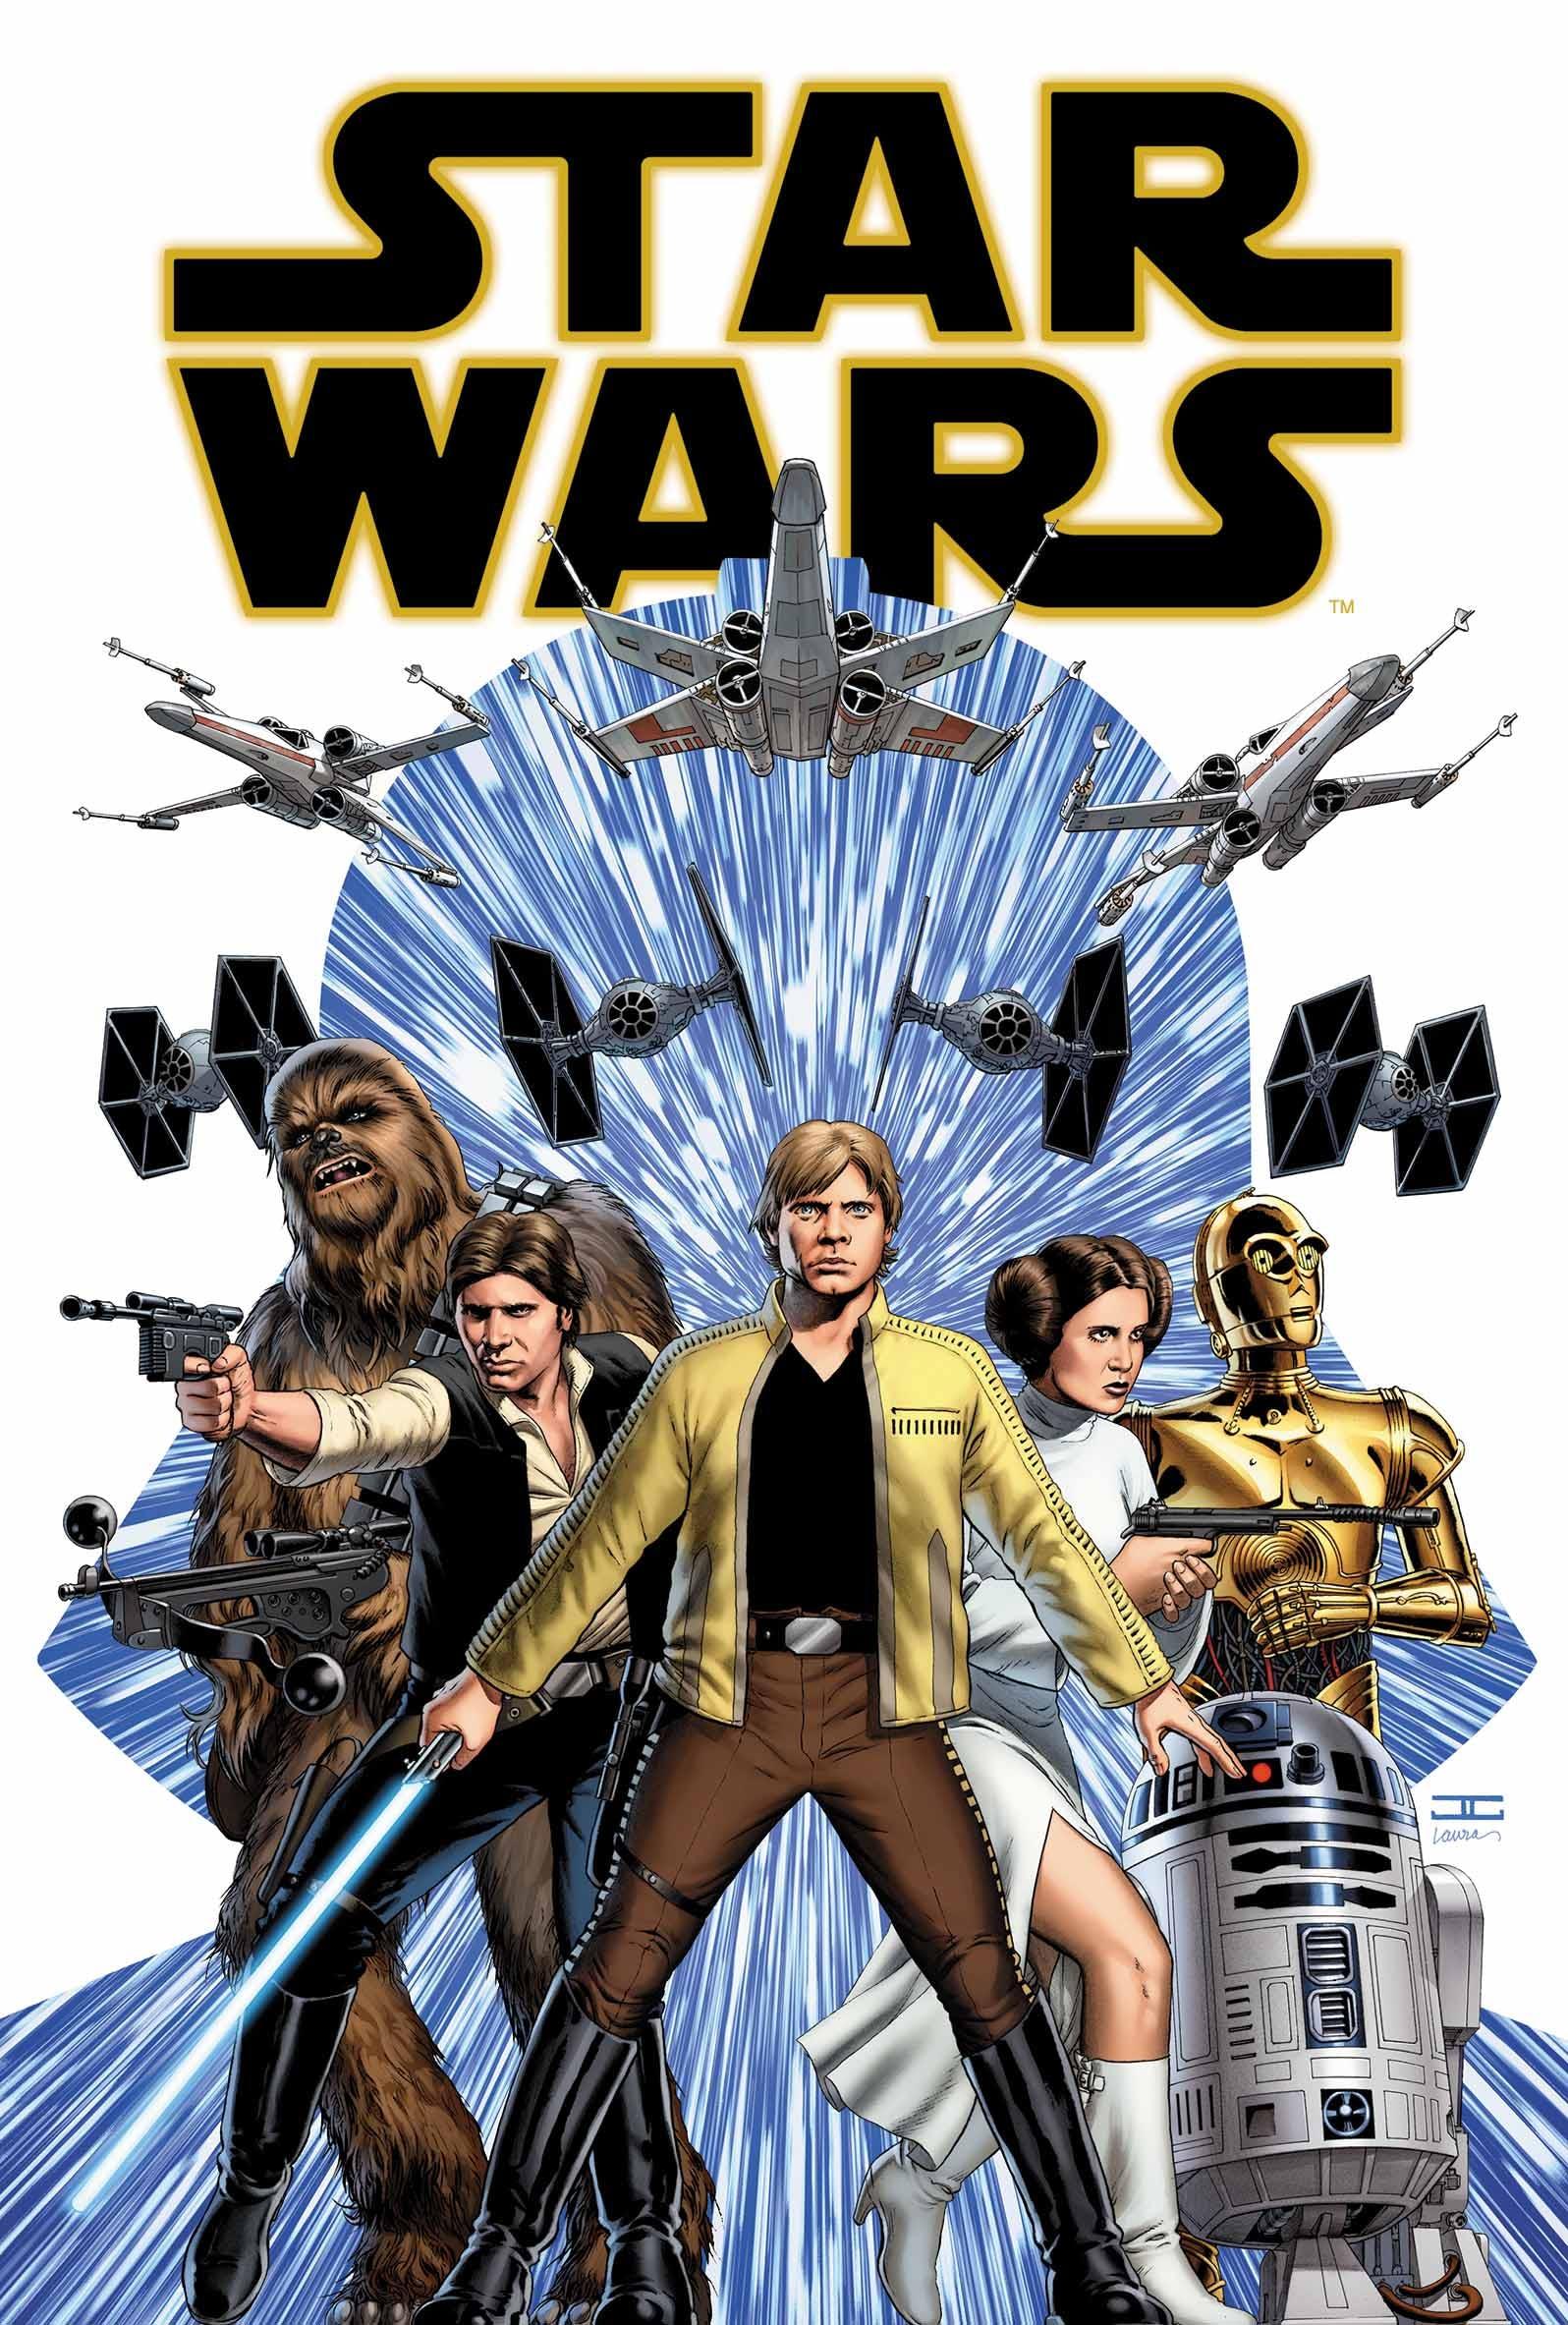 Star Wars #1 Main Cover.